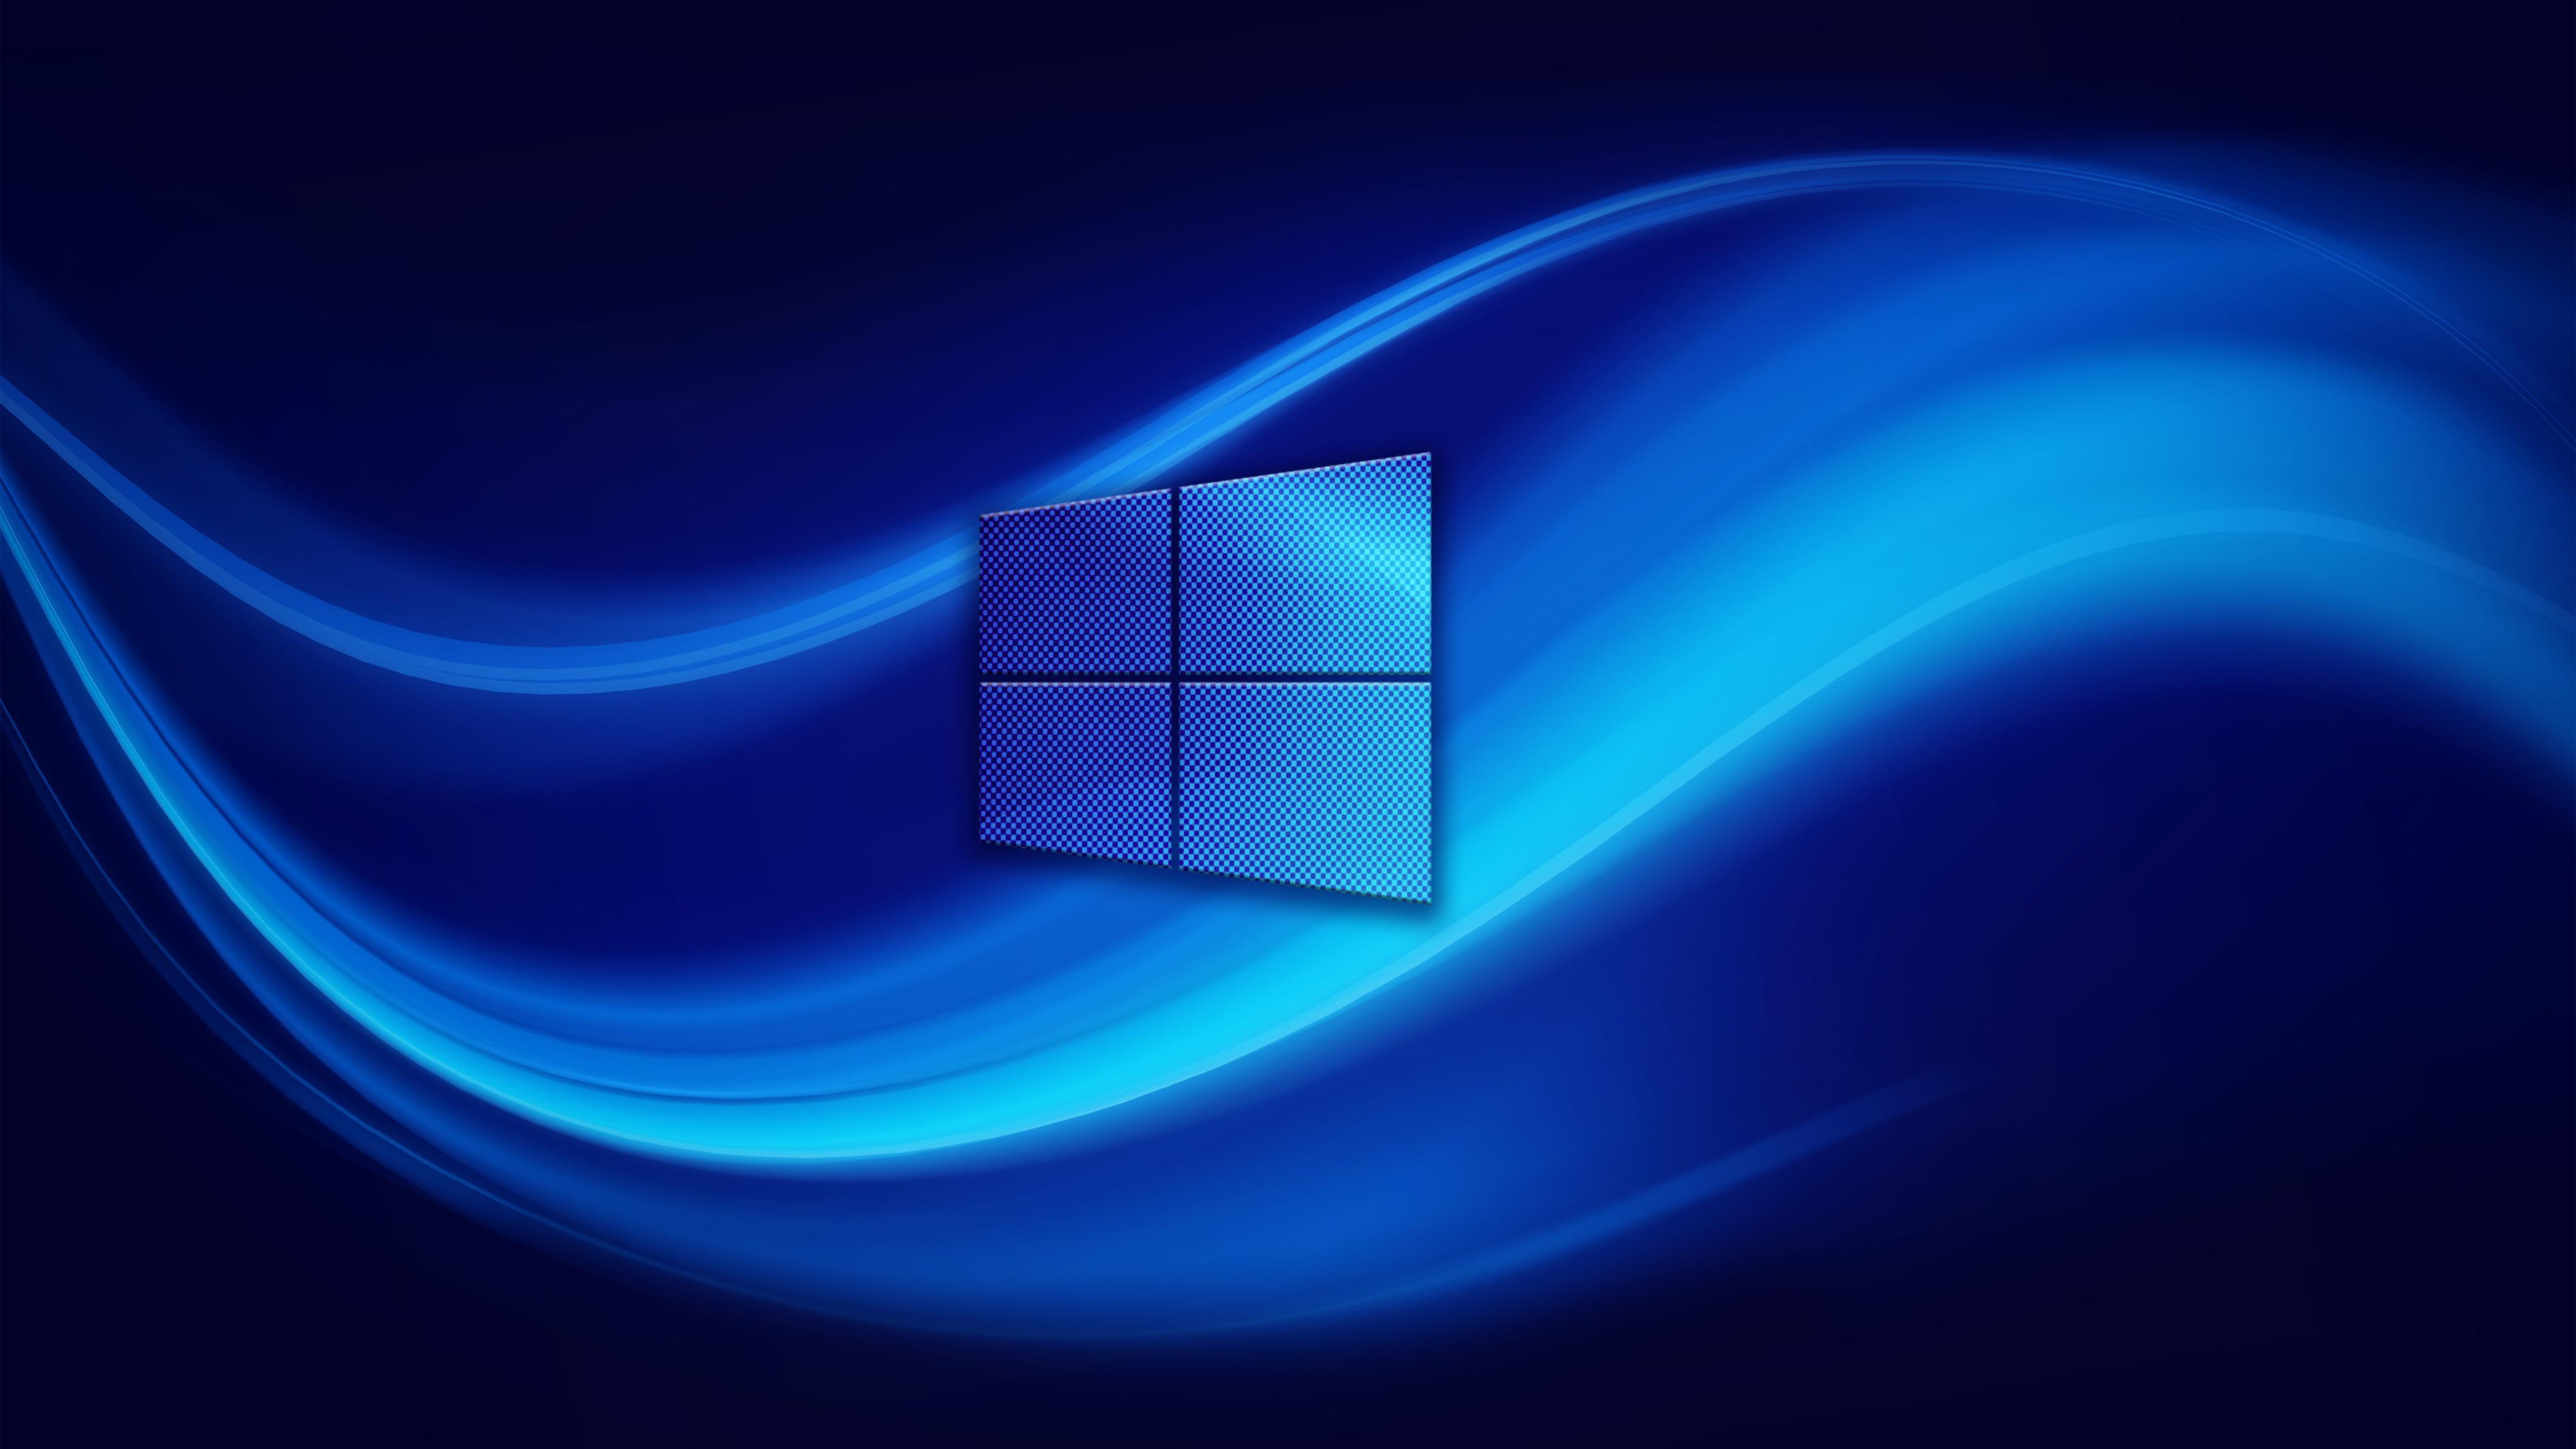 Windows 10 4k Wallpapers Wallpaper Cave